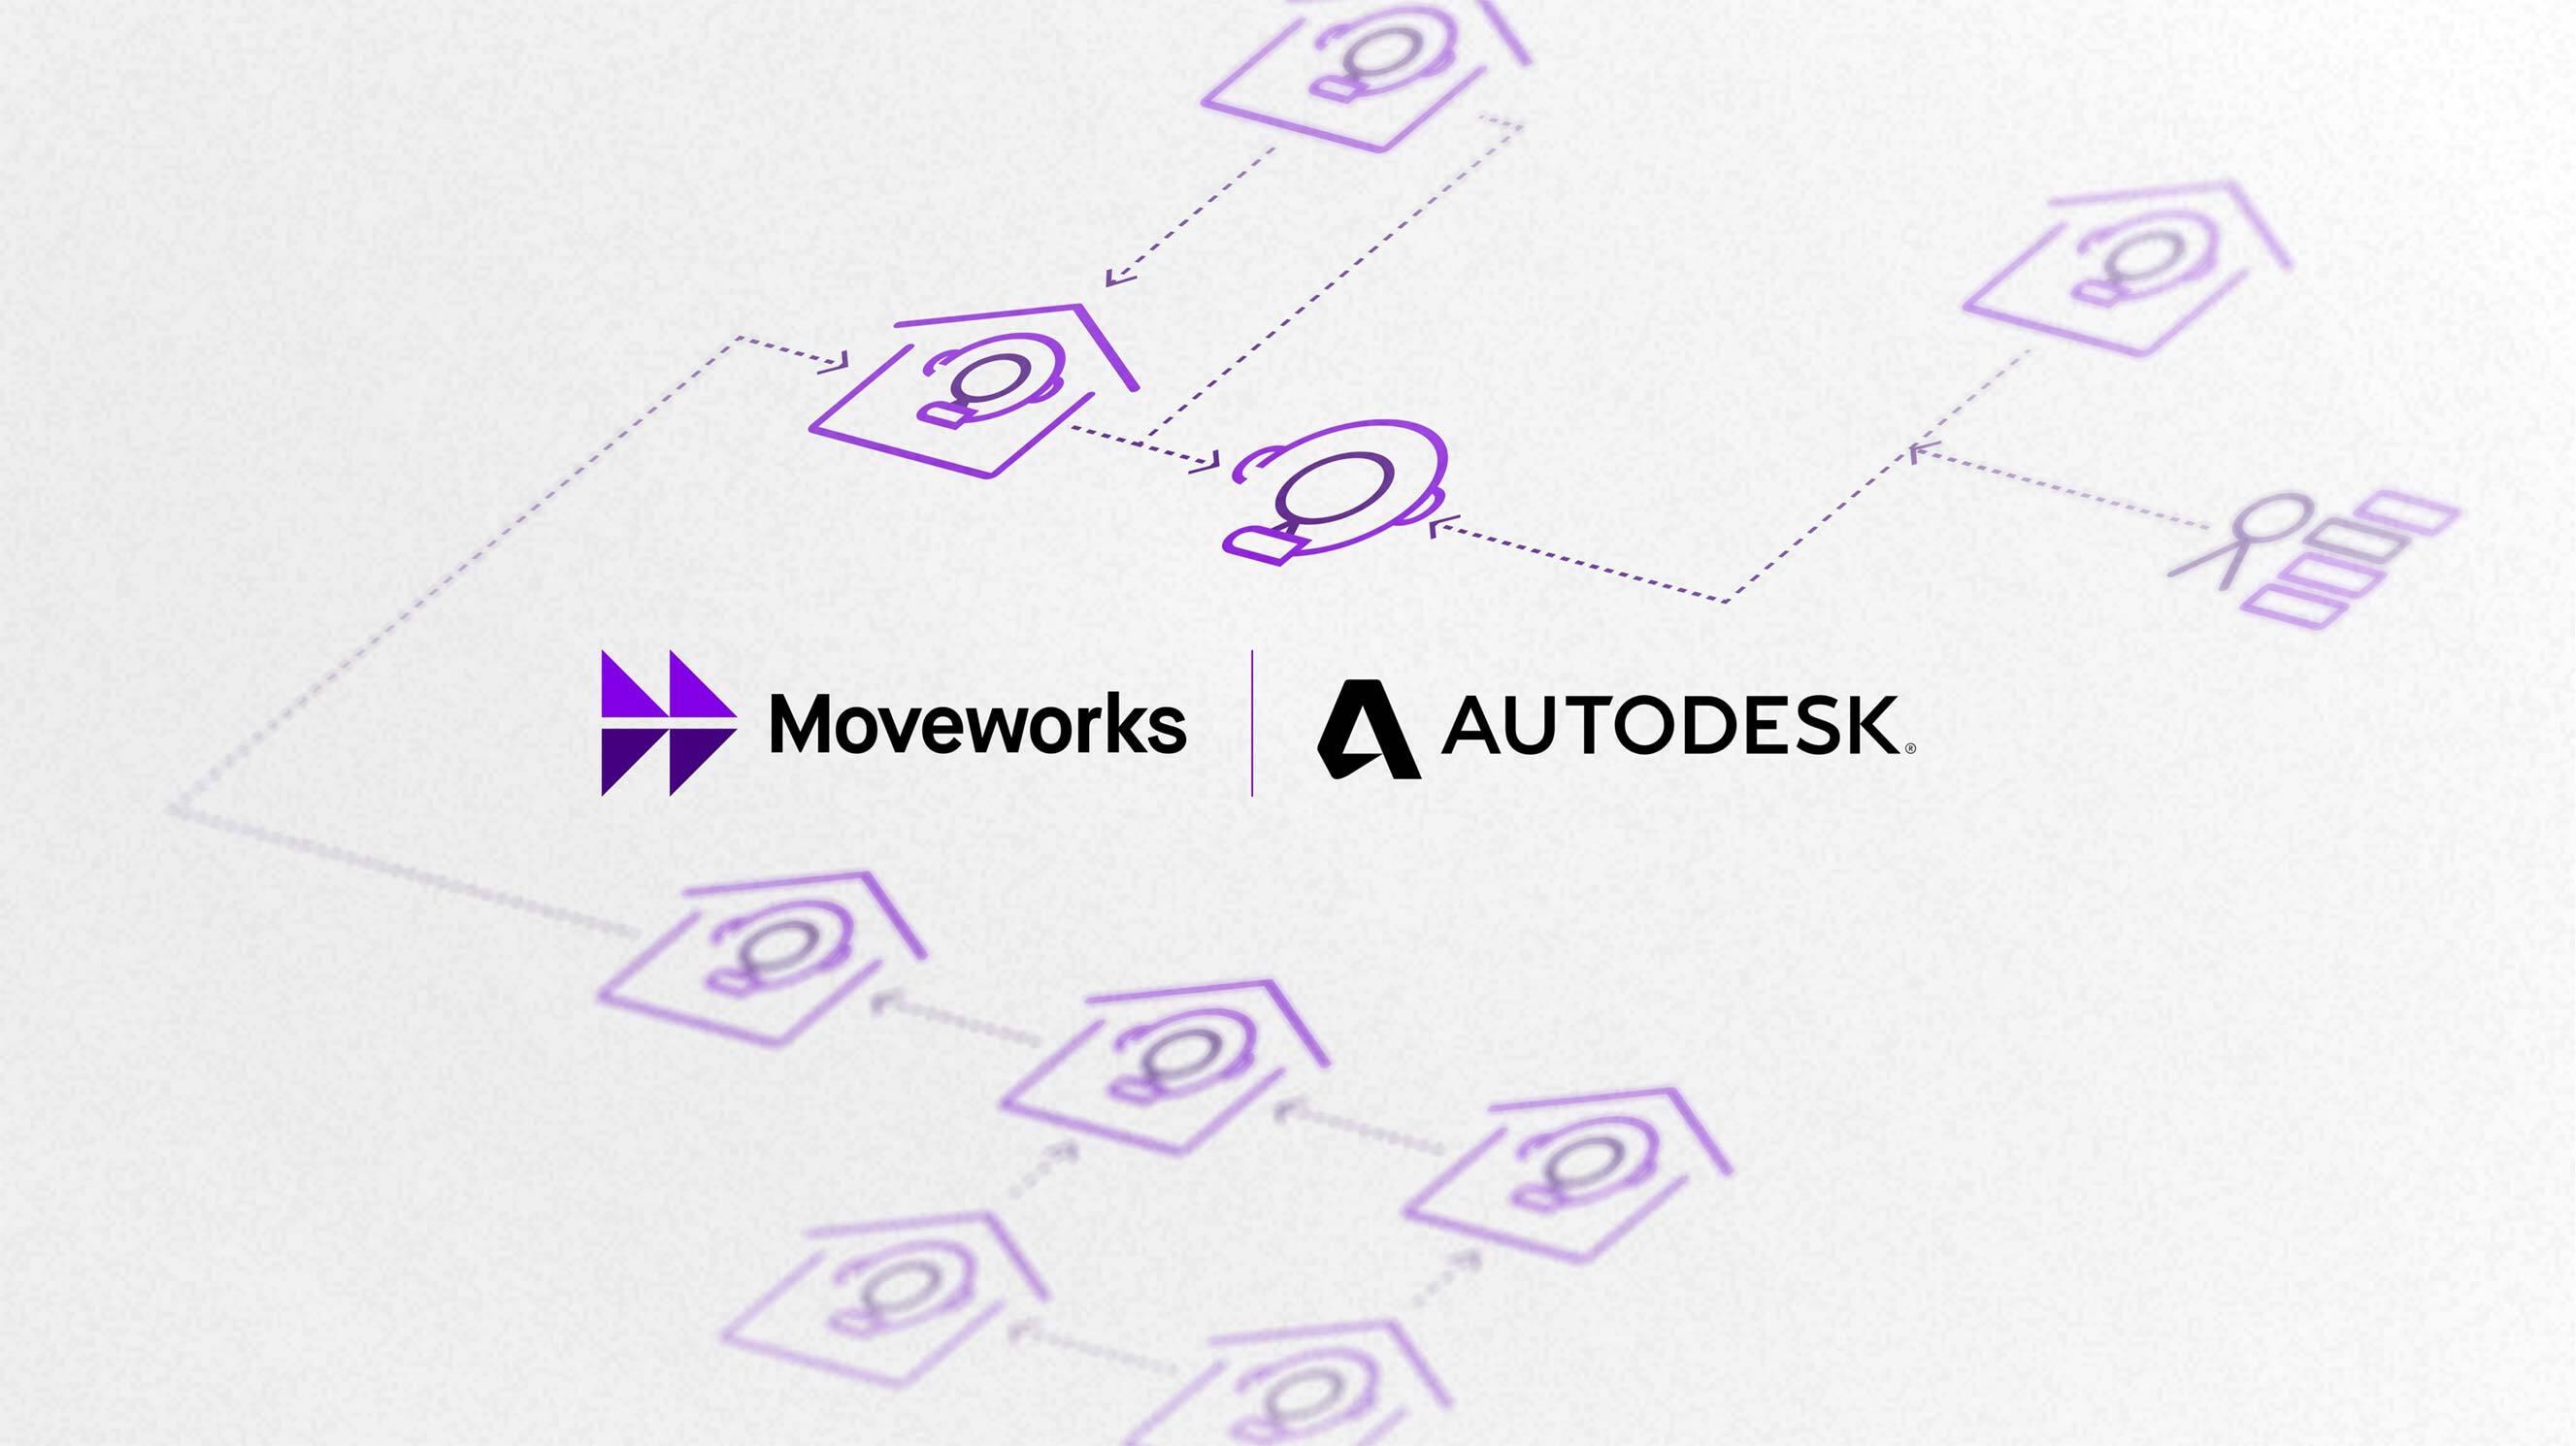 hero-graphic-light-05-blur-autodesk-1